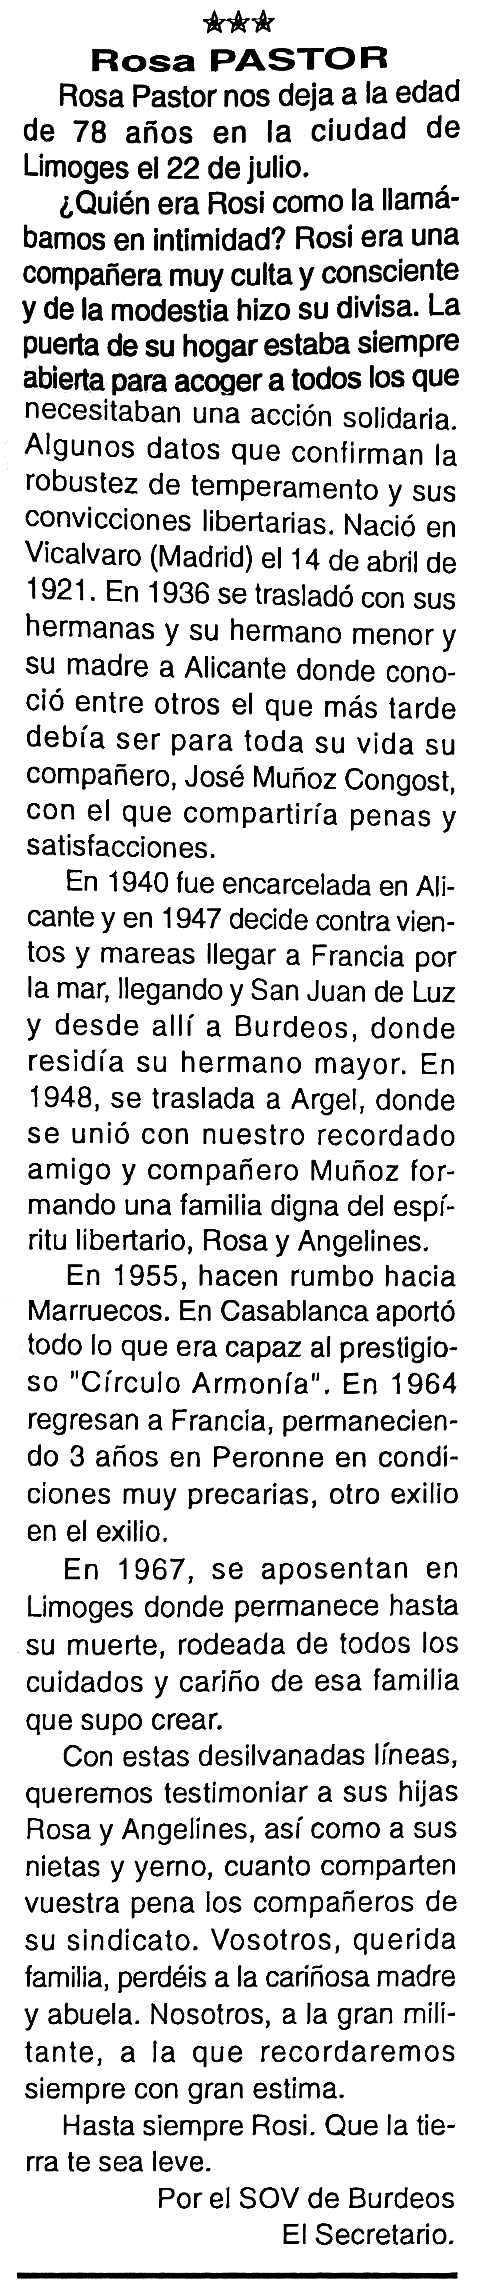 "Necrològica de Rosa Pastor apareguda en el periòdic tolosà ""Cenit"" del 28 de setembre de 1999"